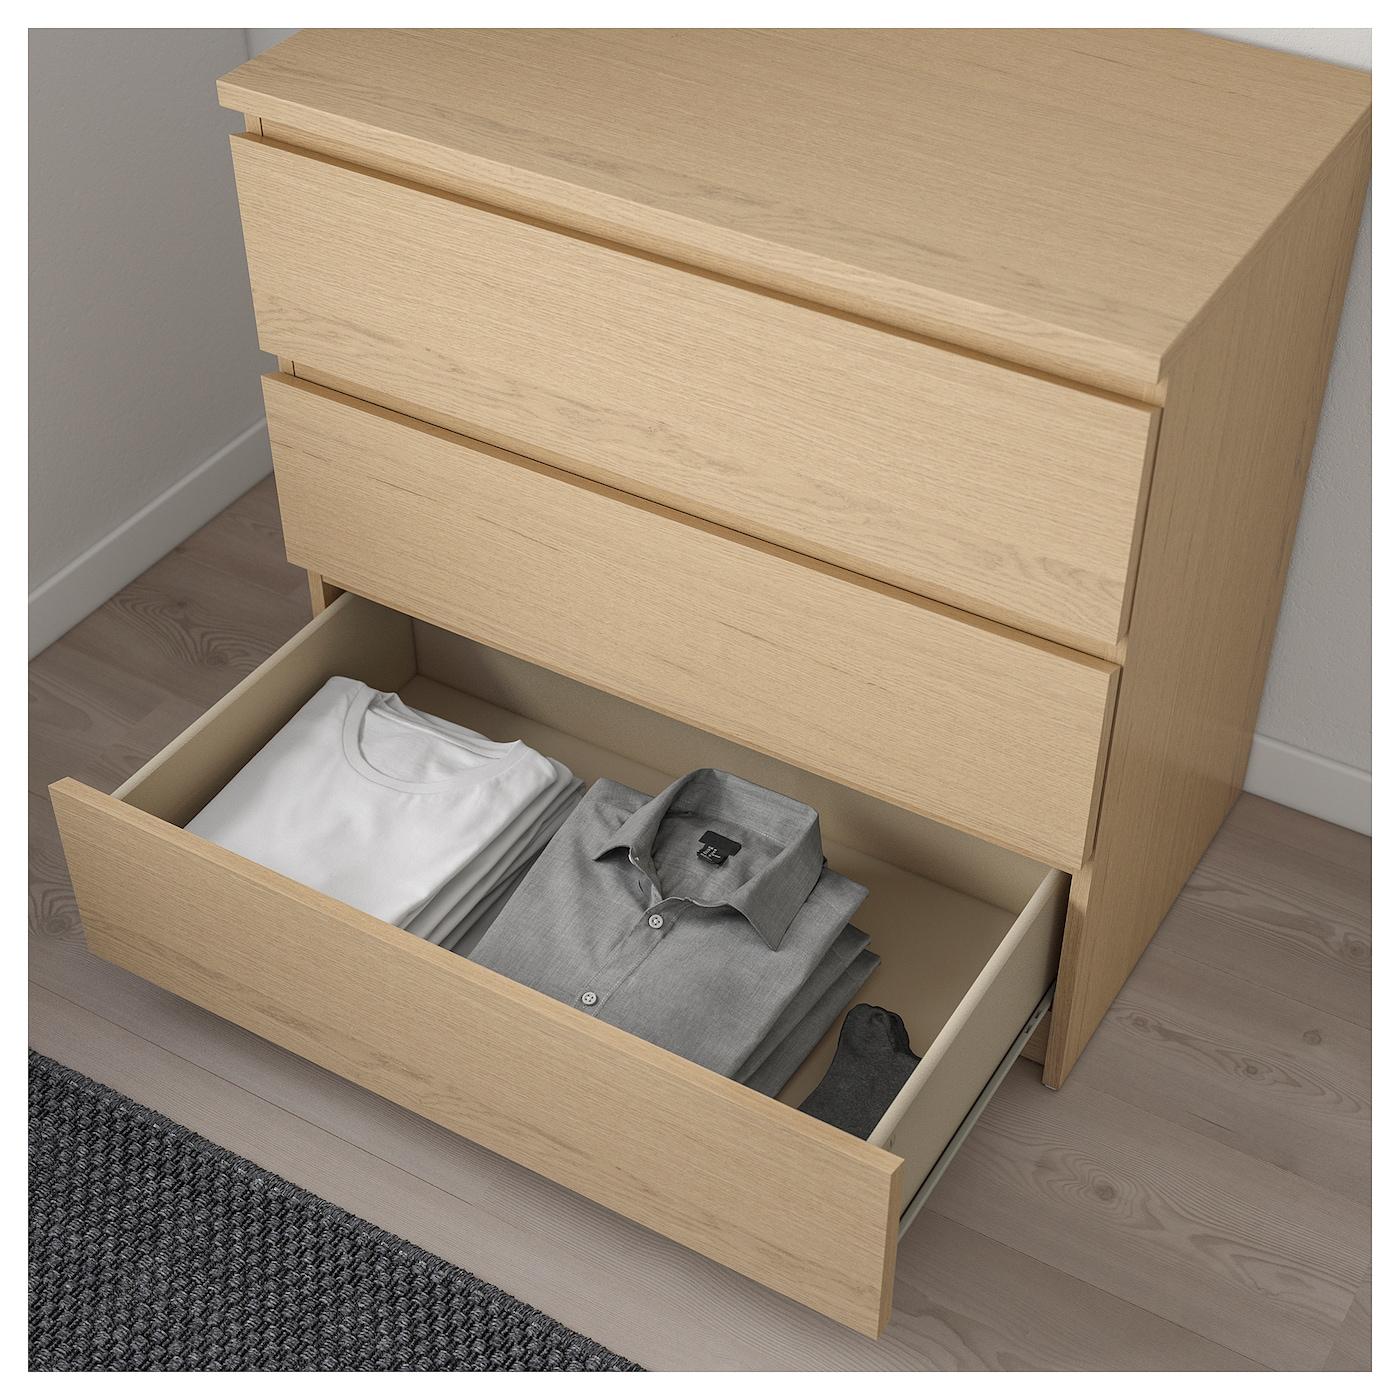 malm commode 3 tiroirs plaqu ch ne blanchi 80x78 cm ikea. Black Bedroom Furniture Sets. Home Design Ideas